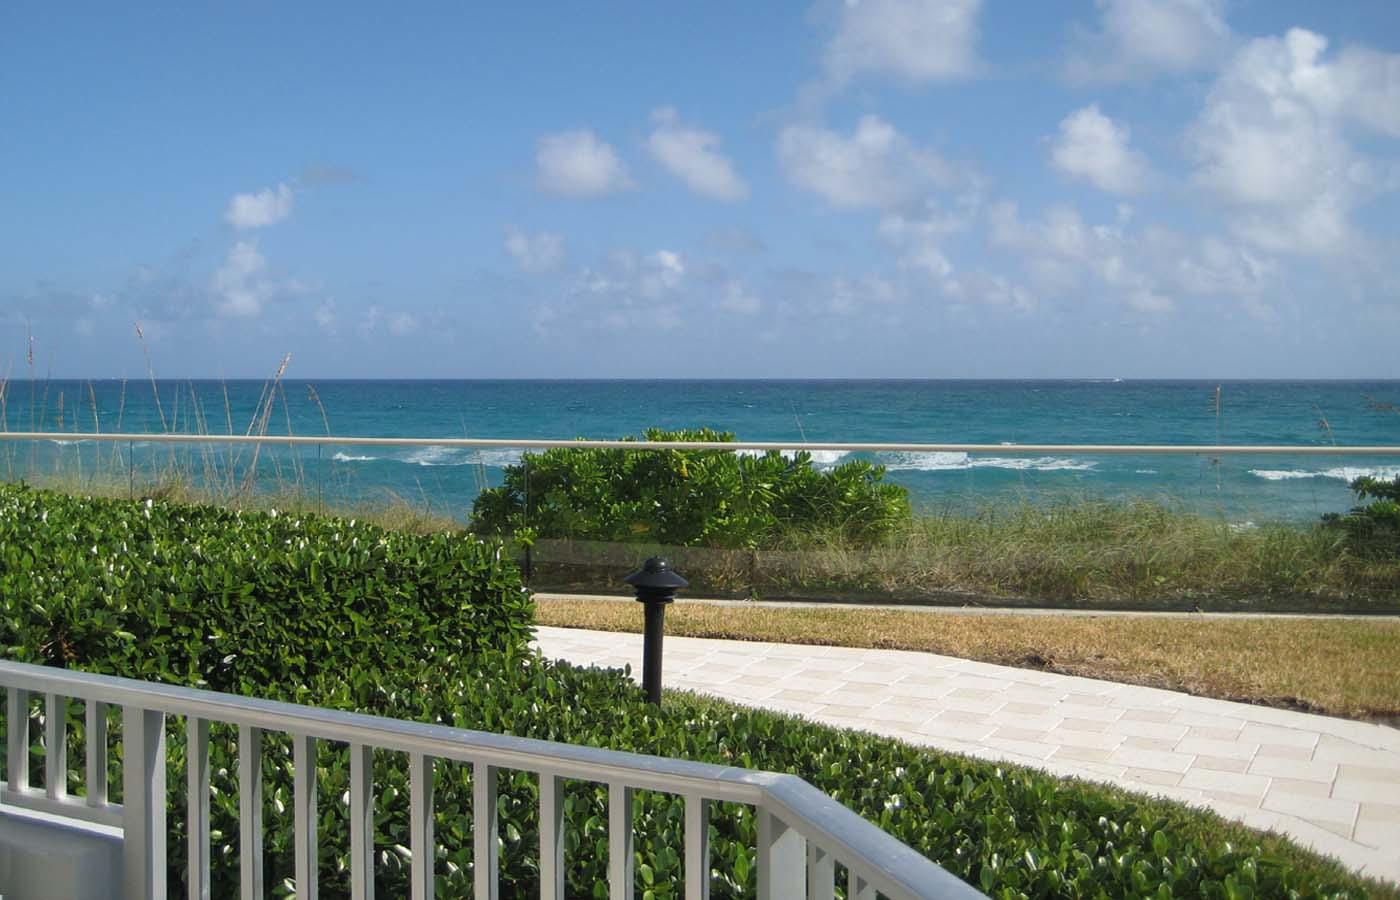 5200 N Ocean Dr 102 Singer Island FL 33404 Martin Group Ocean View from Porch 1400x900